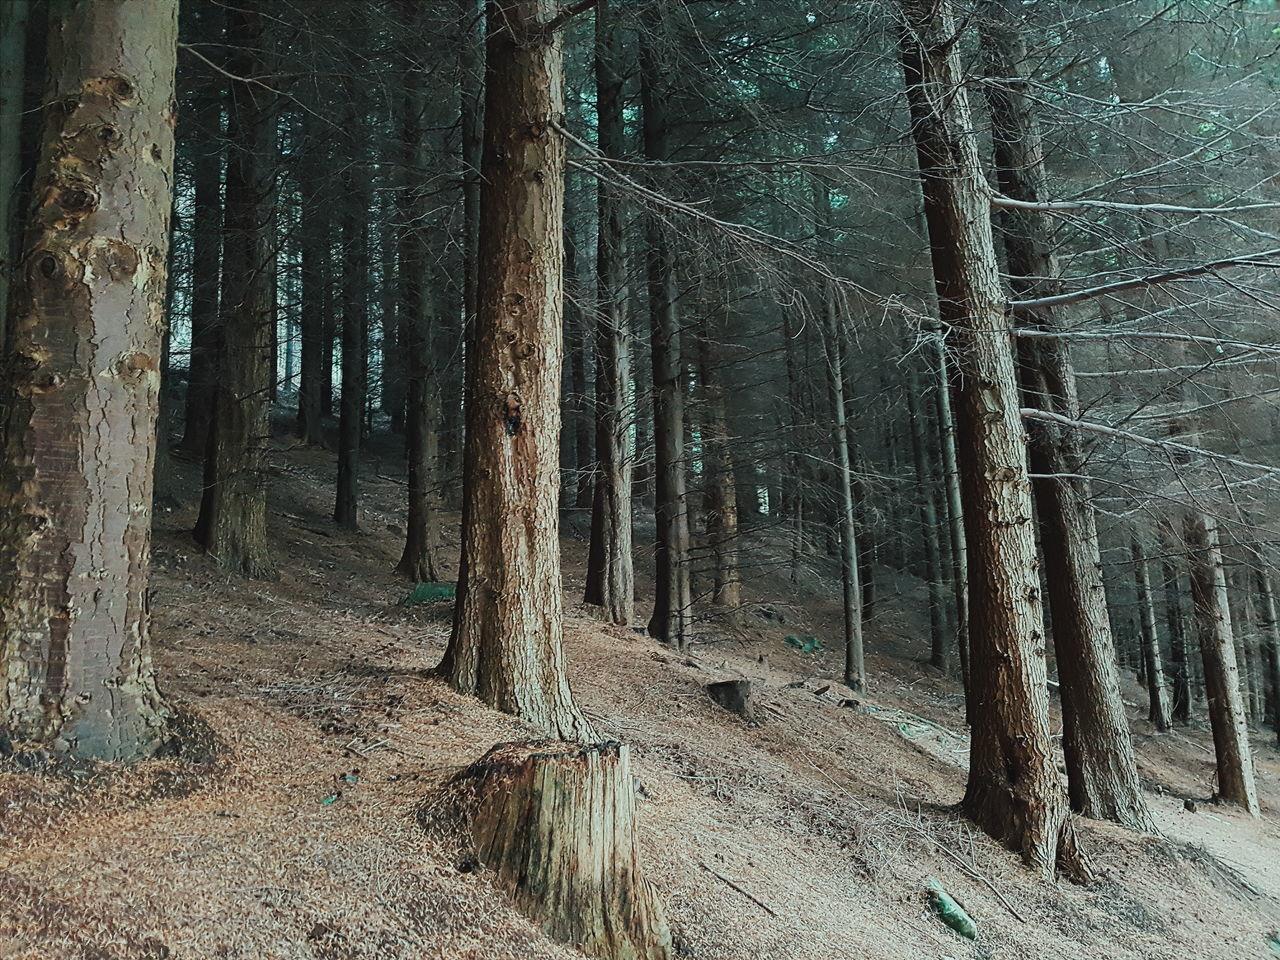 Forest Ireland Northernireland Ireland Countydown Castlewellan Castlewellan Forest Park Summer Trees Lonliness Quiet Dark Contrast Light Nature Deep